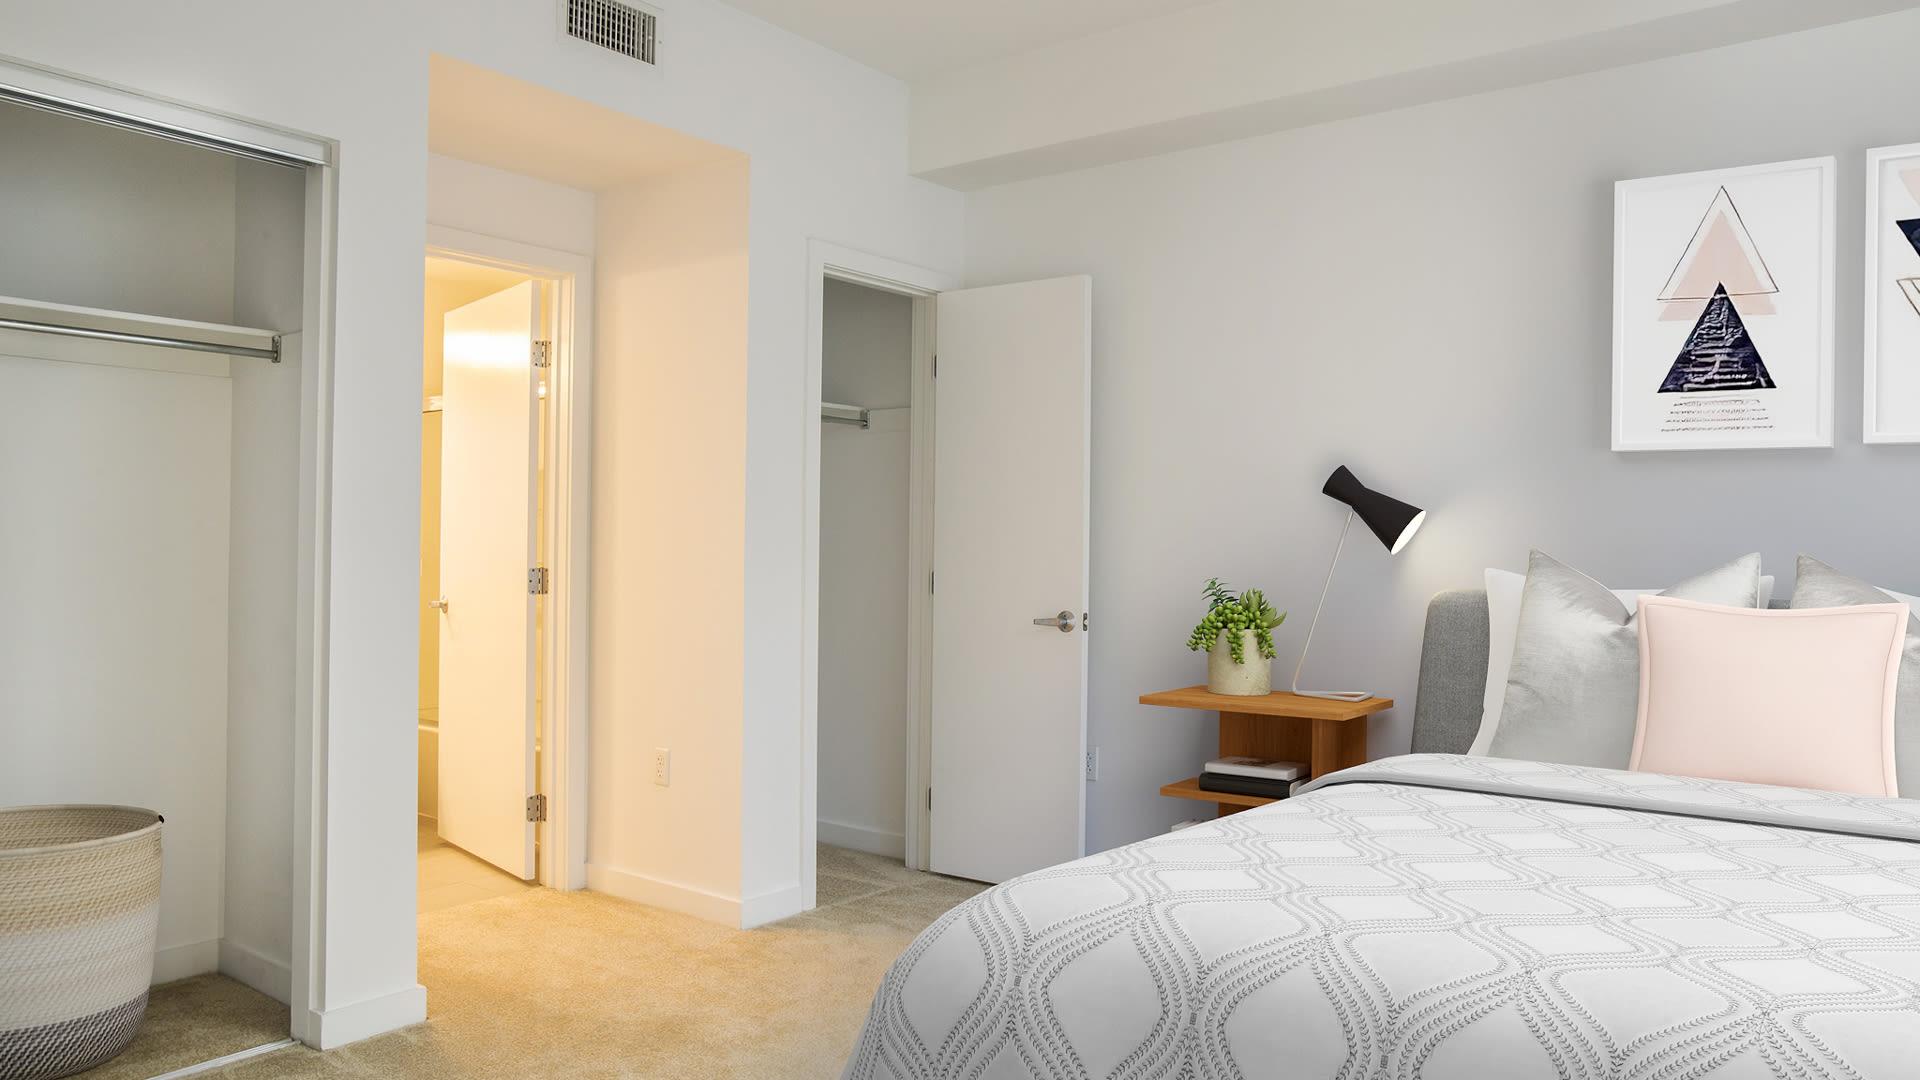 Sakura Crossings Apartments - Bedroom with Walk-In Closet